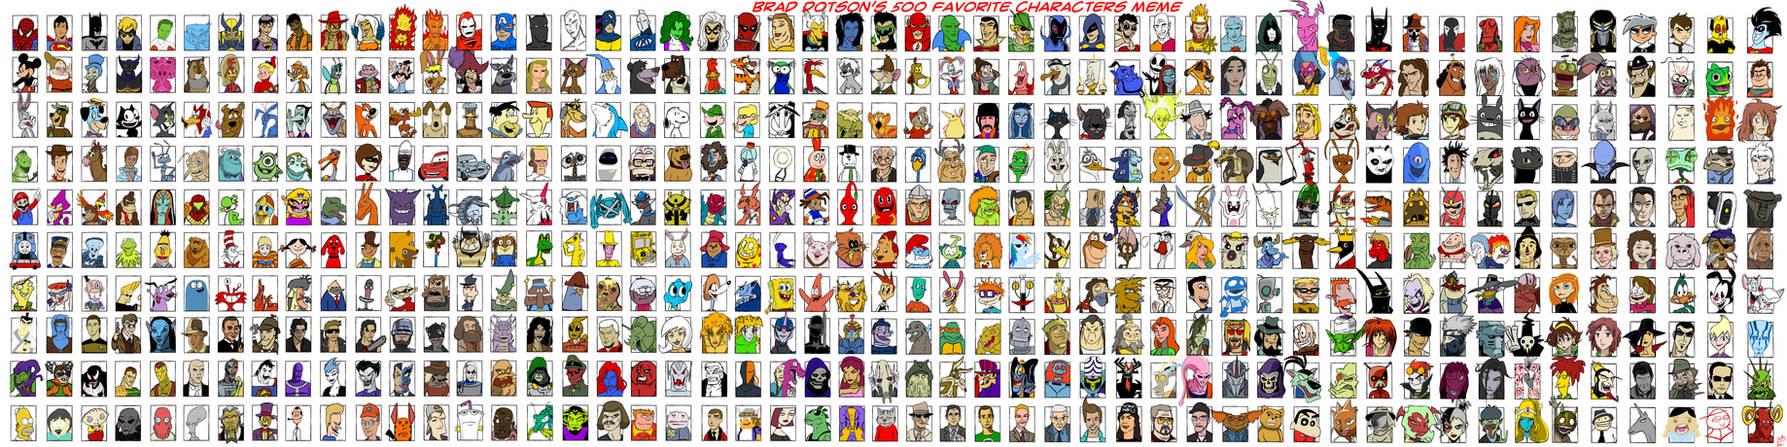 Brad Dotson's 500 Favorite Characters Meme by TheZoologist